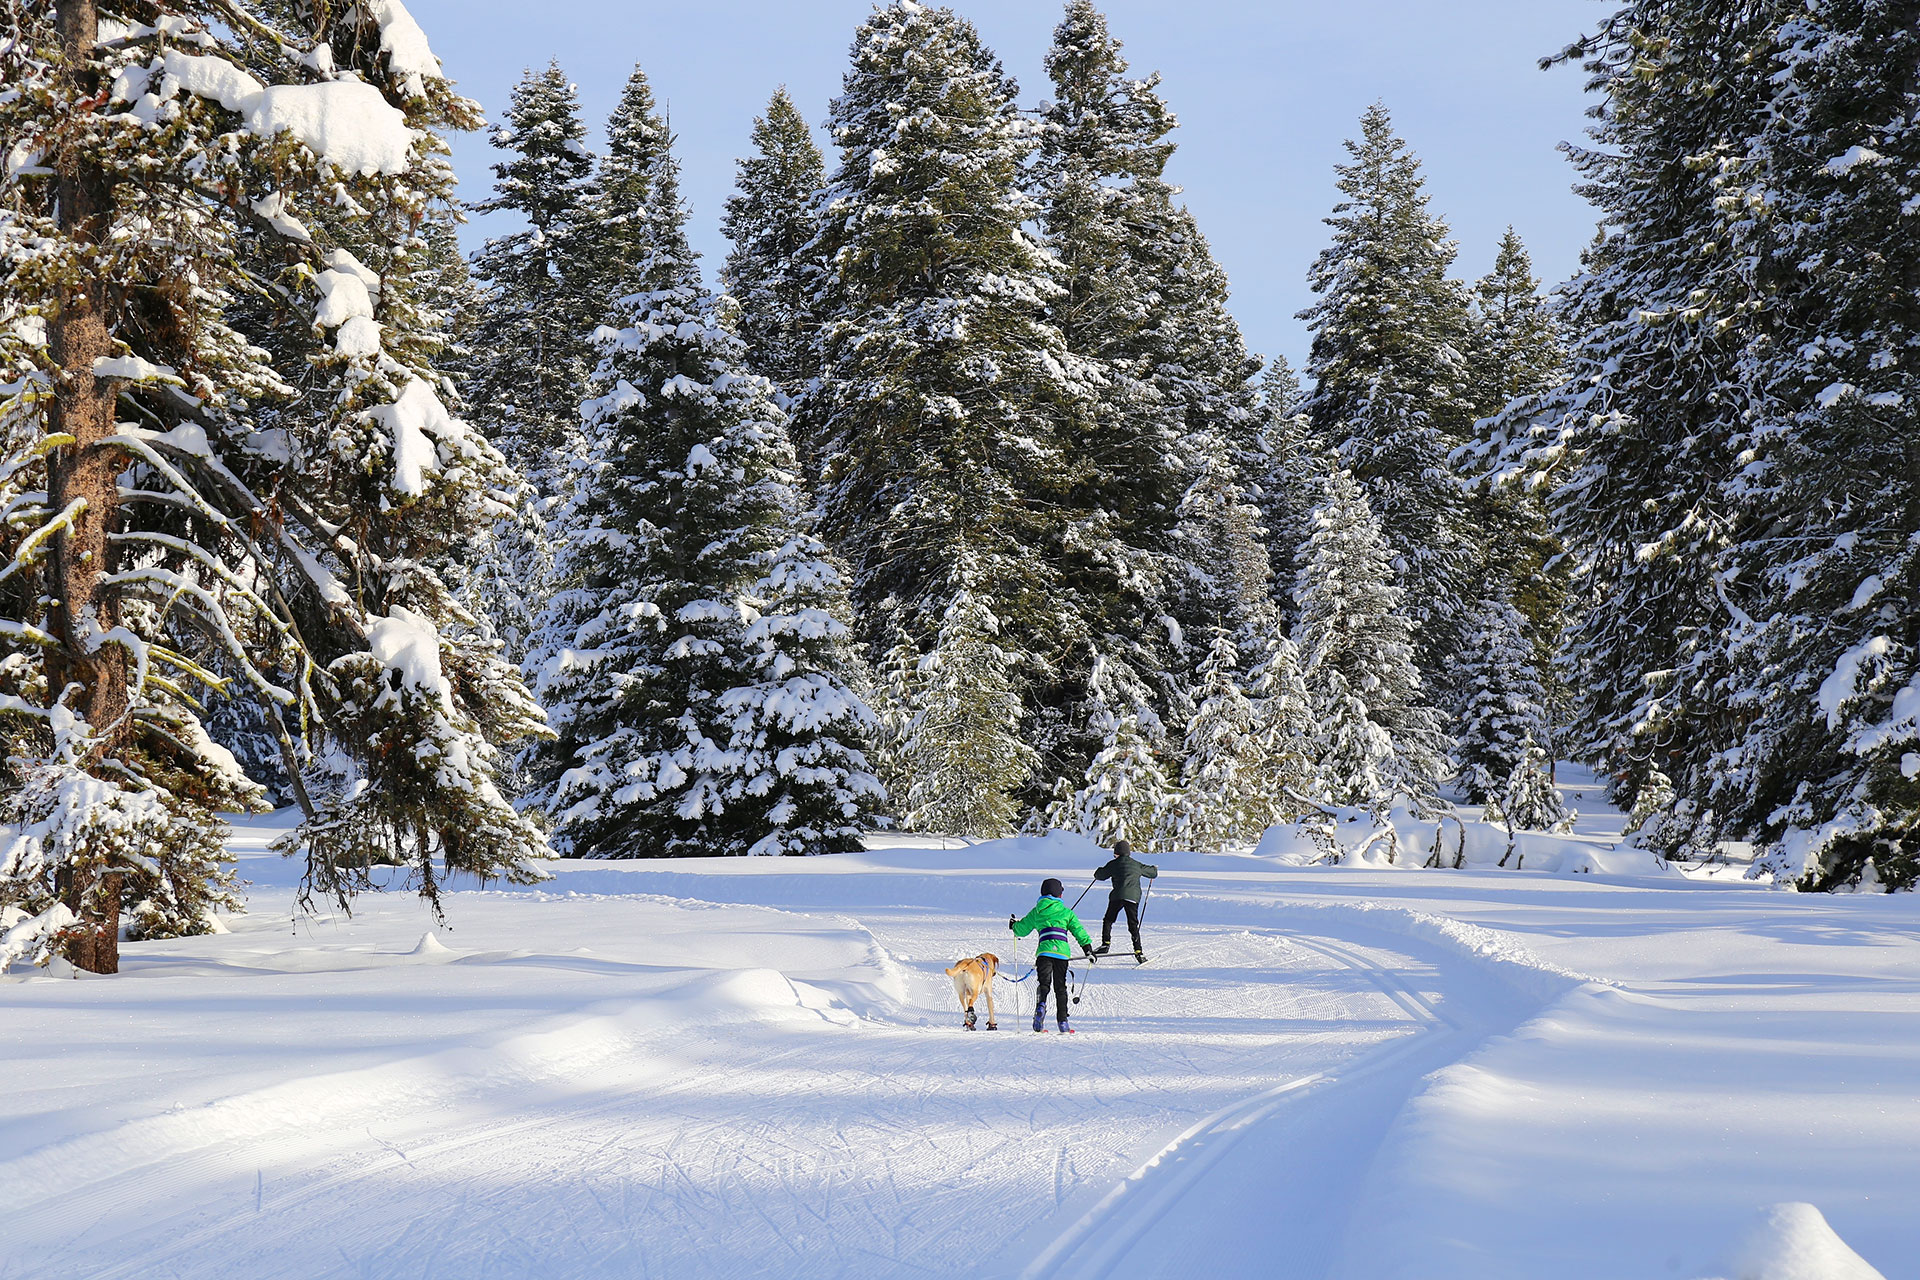 McCall, Idaho; Courtesy of CSNafzger/Shutterstock.com